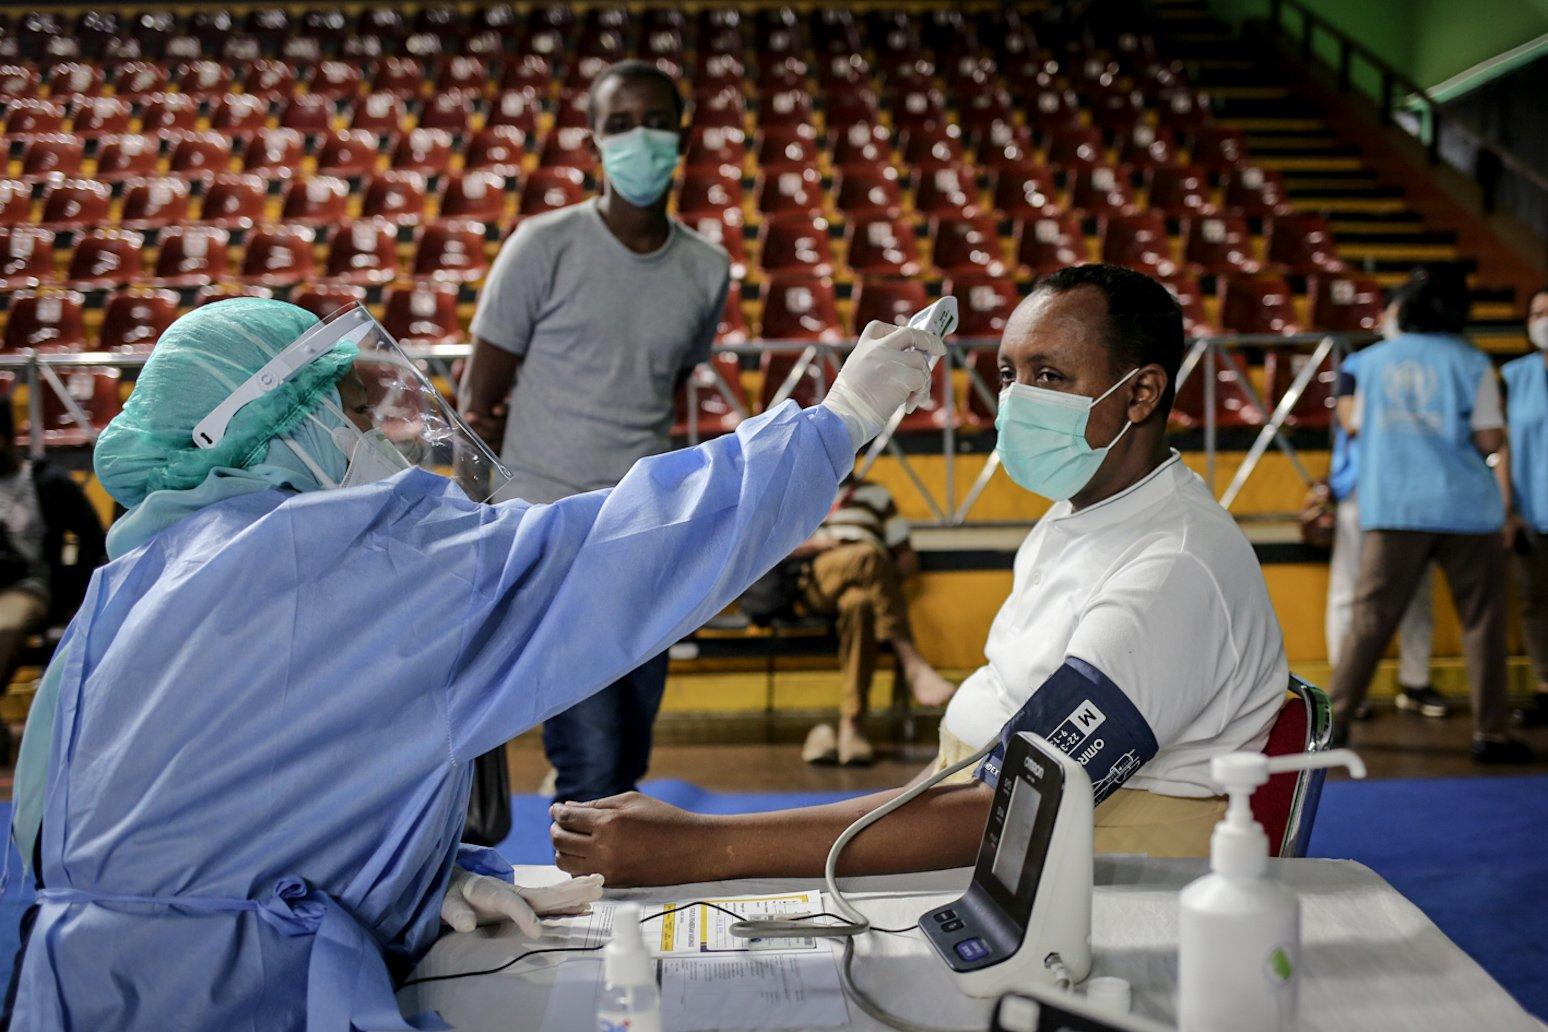 Tenaga medis memeriksa suhu tubuh pencari suaka menggunakan termometer saat vaksinasi COVID-19 di GOR Bulungan, Jakarta Selatan, Kamis (7/10/2021). \r\nVaksinasi tersebut digelar atas kerja sama Pemprov DKI Jakarta, UNHCR dan Kadin Indonesia. \r\nSebanyak 600 vaksin dosis pertama disediakan dalam vaksinasi tersebut.